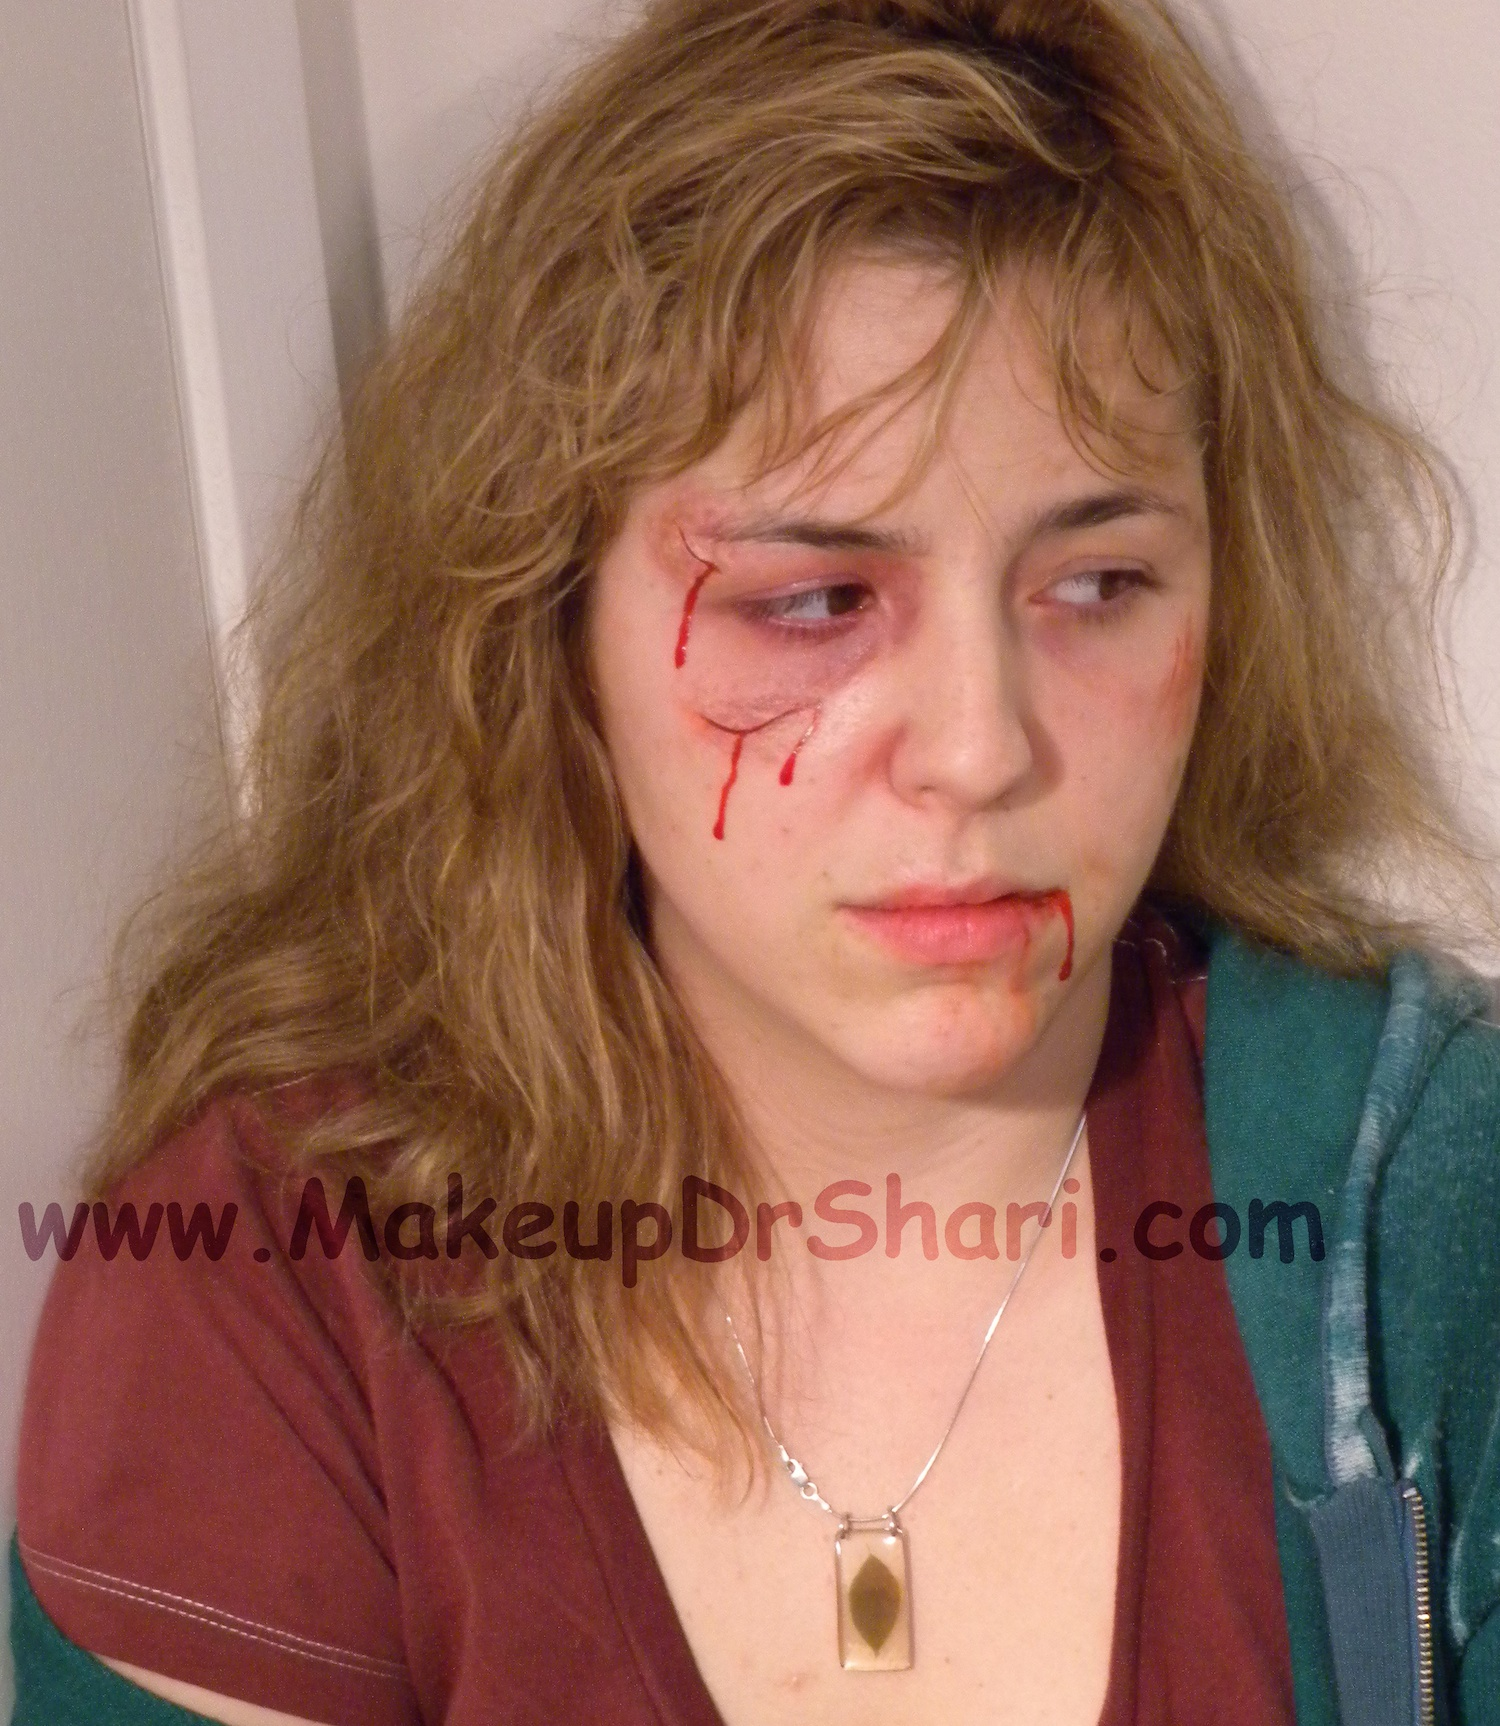 31 Days Of Halloween Makeup U2013 Day 7 Bruise Wheels | Movie Makeup By Makeup Dr. Shari